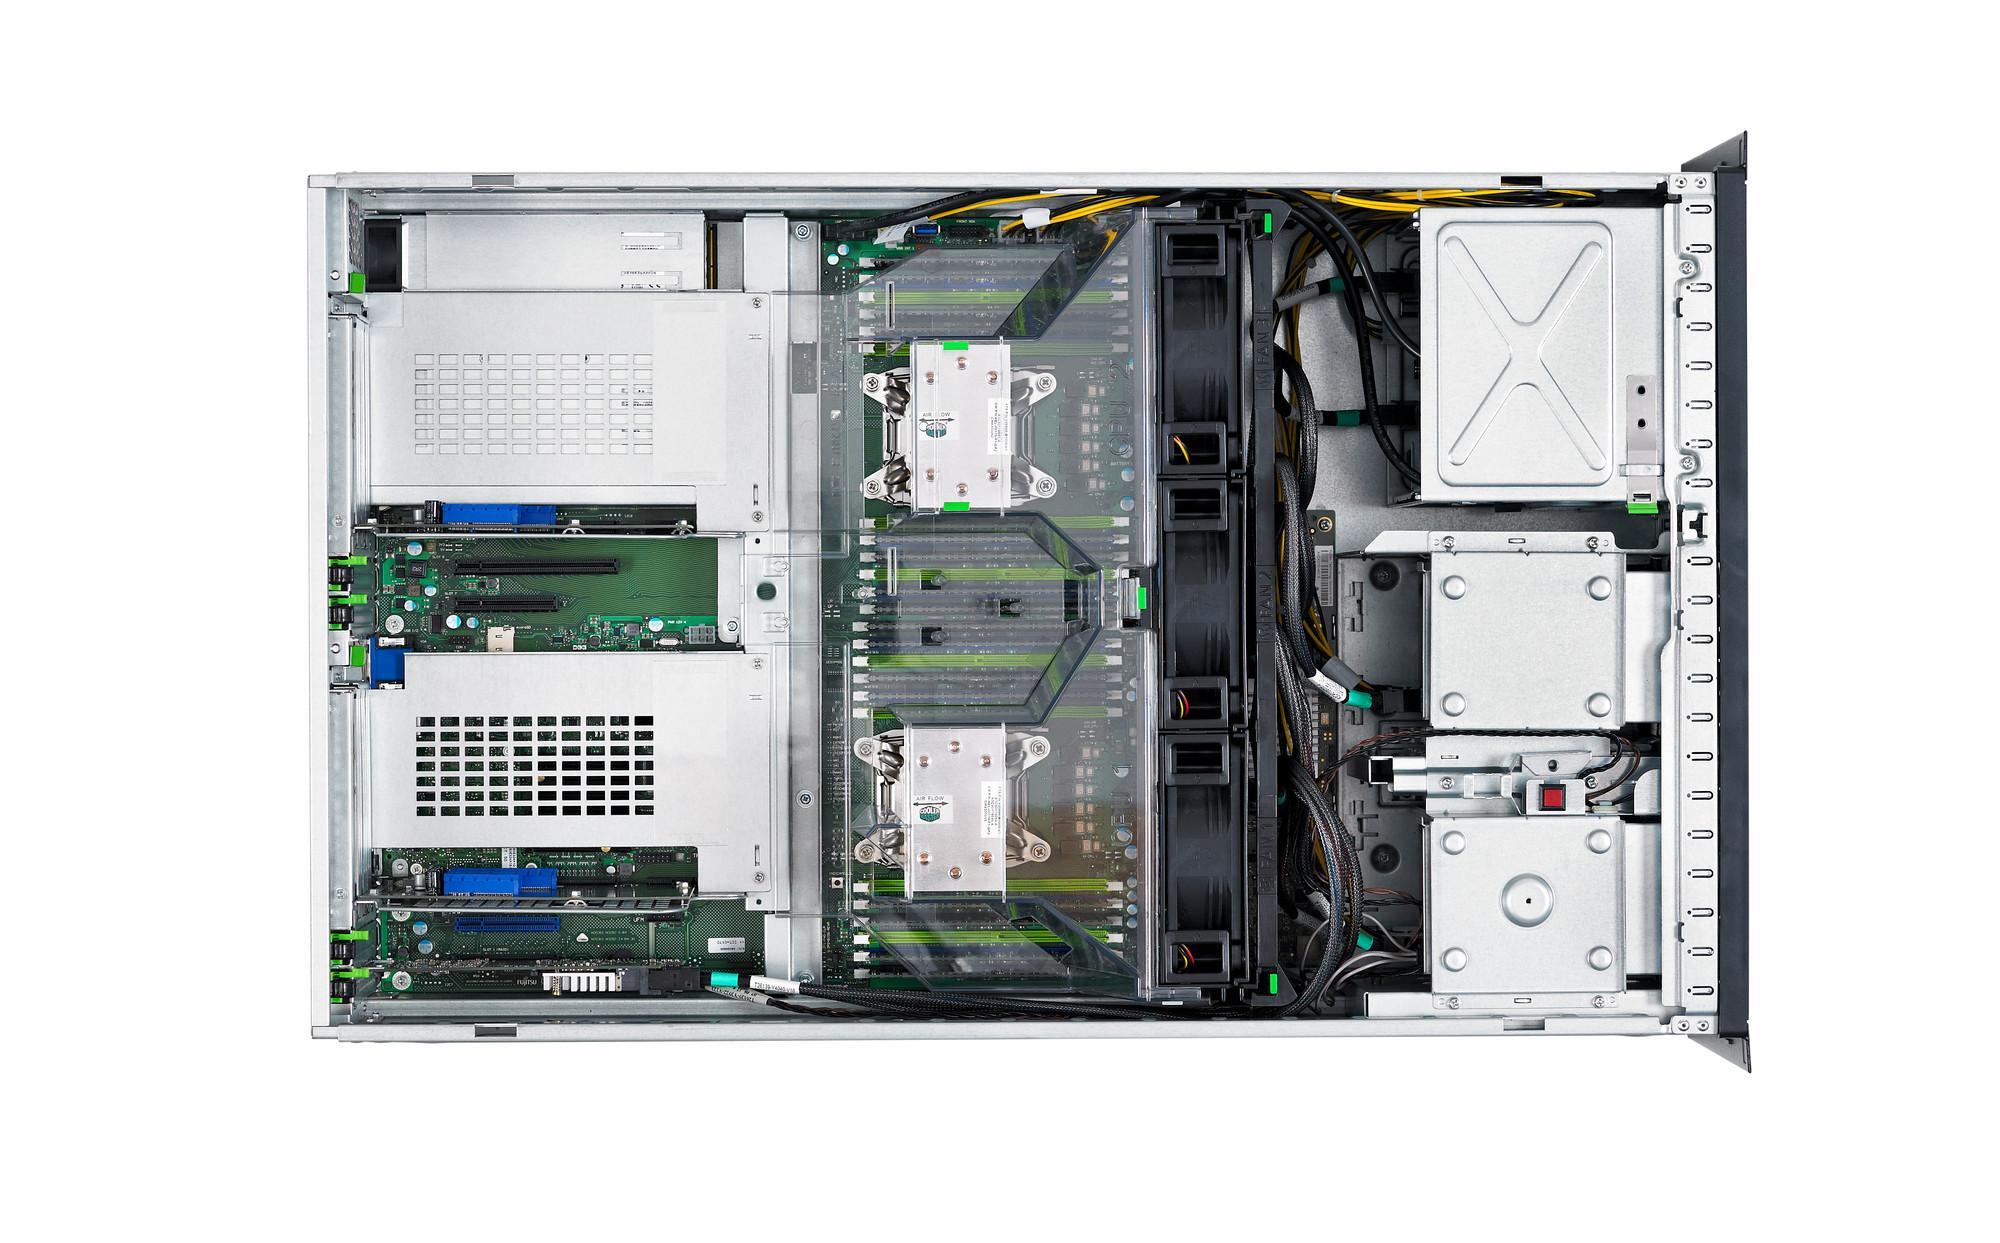 Сървър Primergy TX2560 M2 LFF, Xeon E5-2609v4/8 GB/DVDRW/8x3.5 KIT/RAID 12G 1GB/ 2X1GB IF CARD/KIT/PSU 450W HP